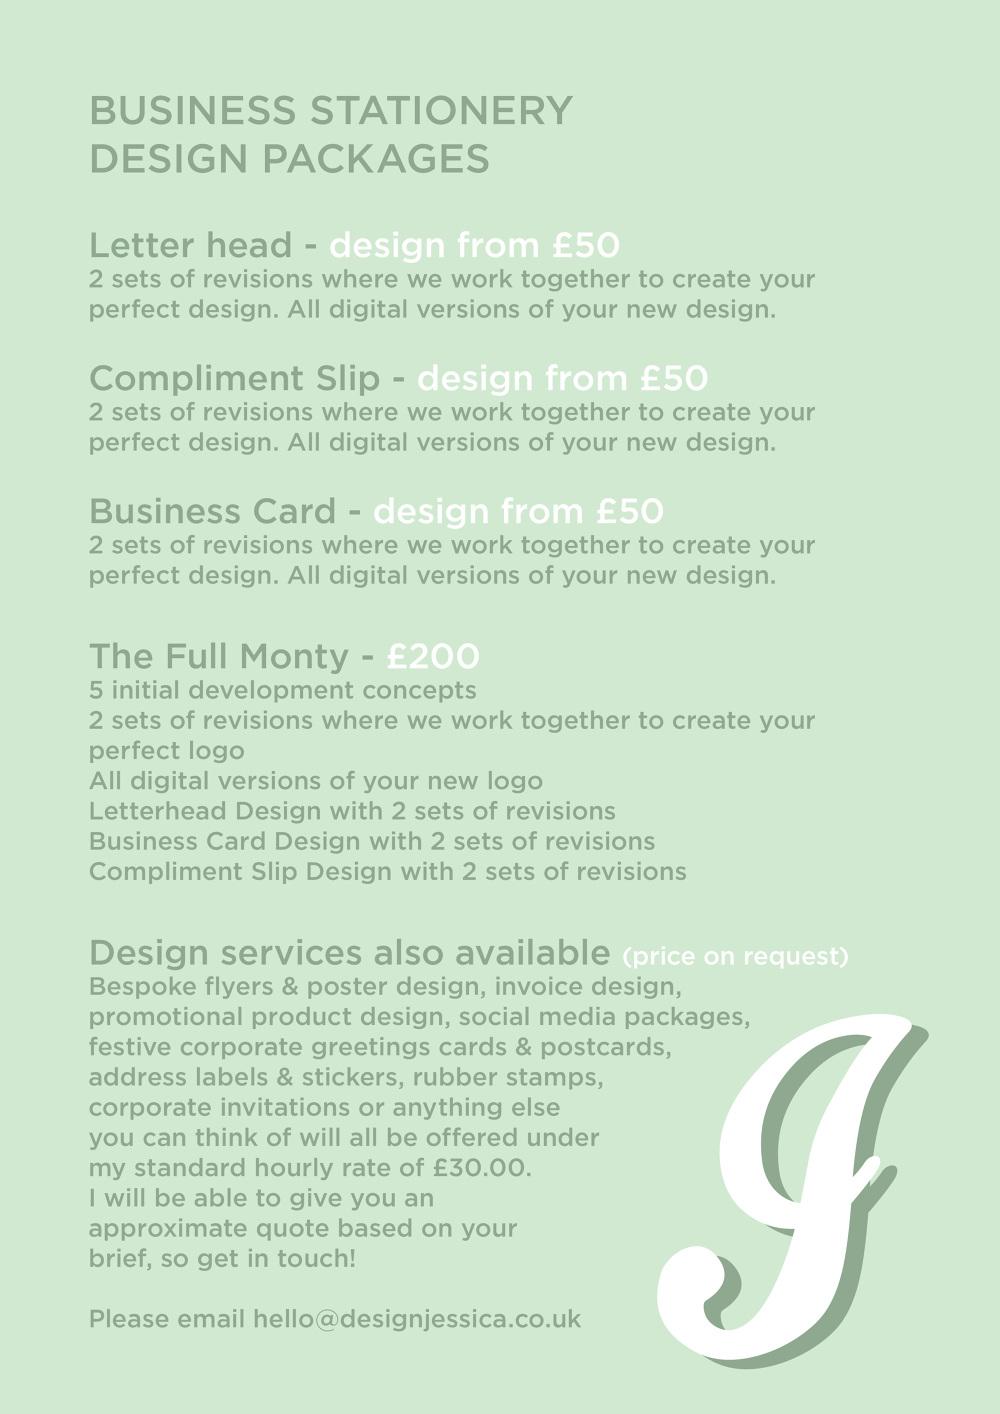 Business Cards, Comp Slips & Letterheads - designjessica - Freelance ...